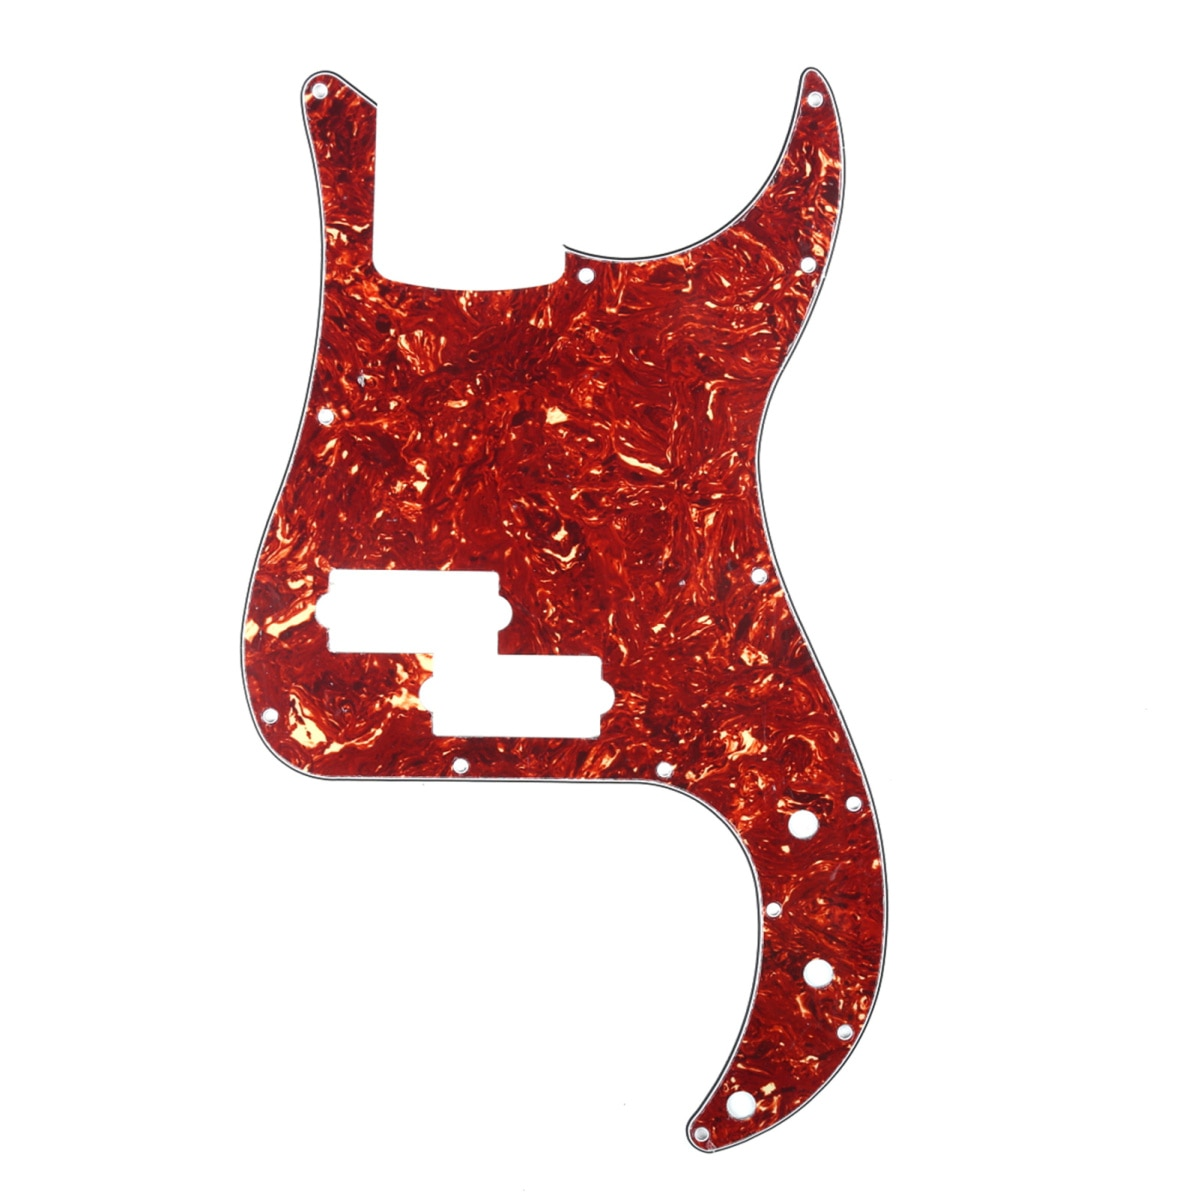 Musiclirio 13 agujero P bajo Pickguard para Fender Americano/mexicano estándar de precisión...